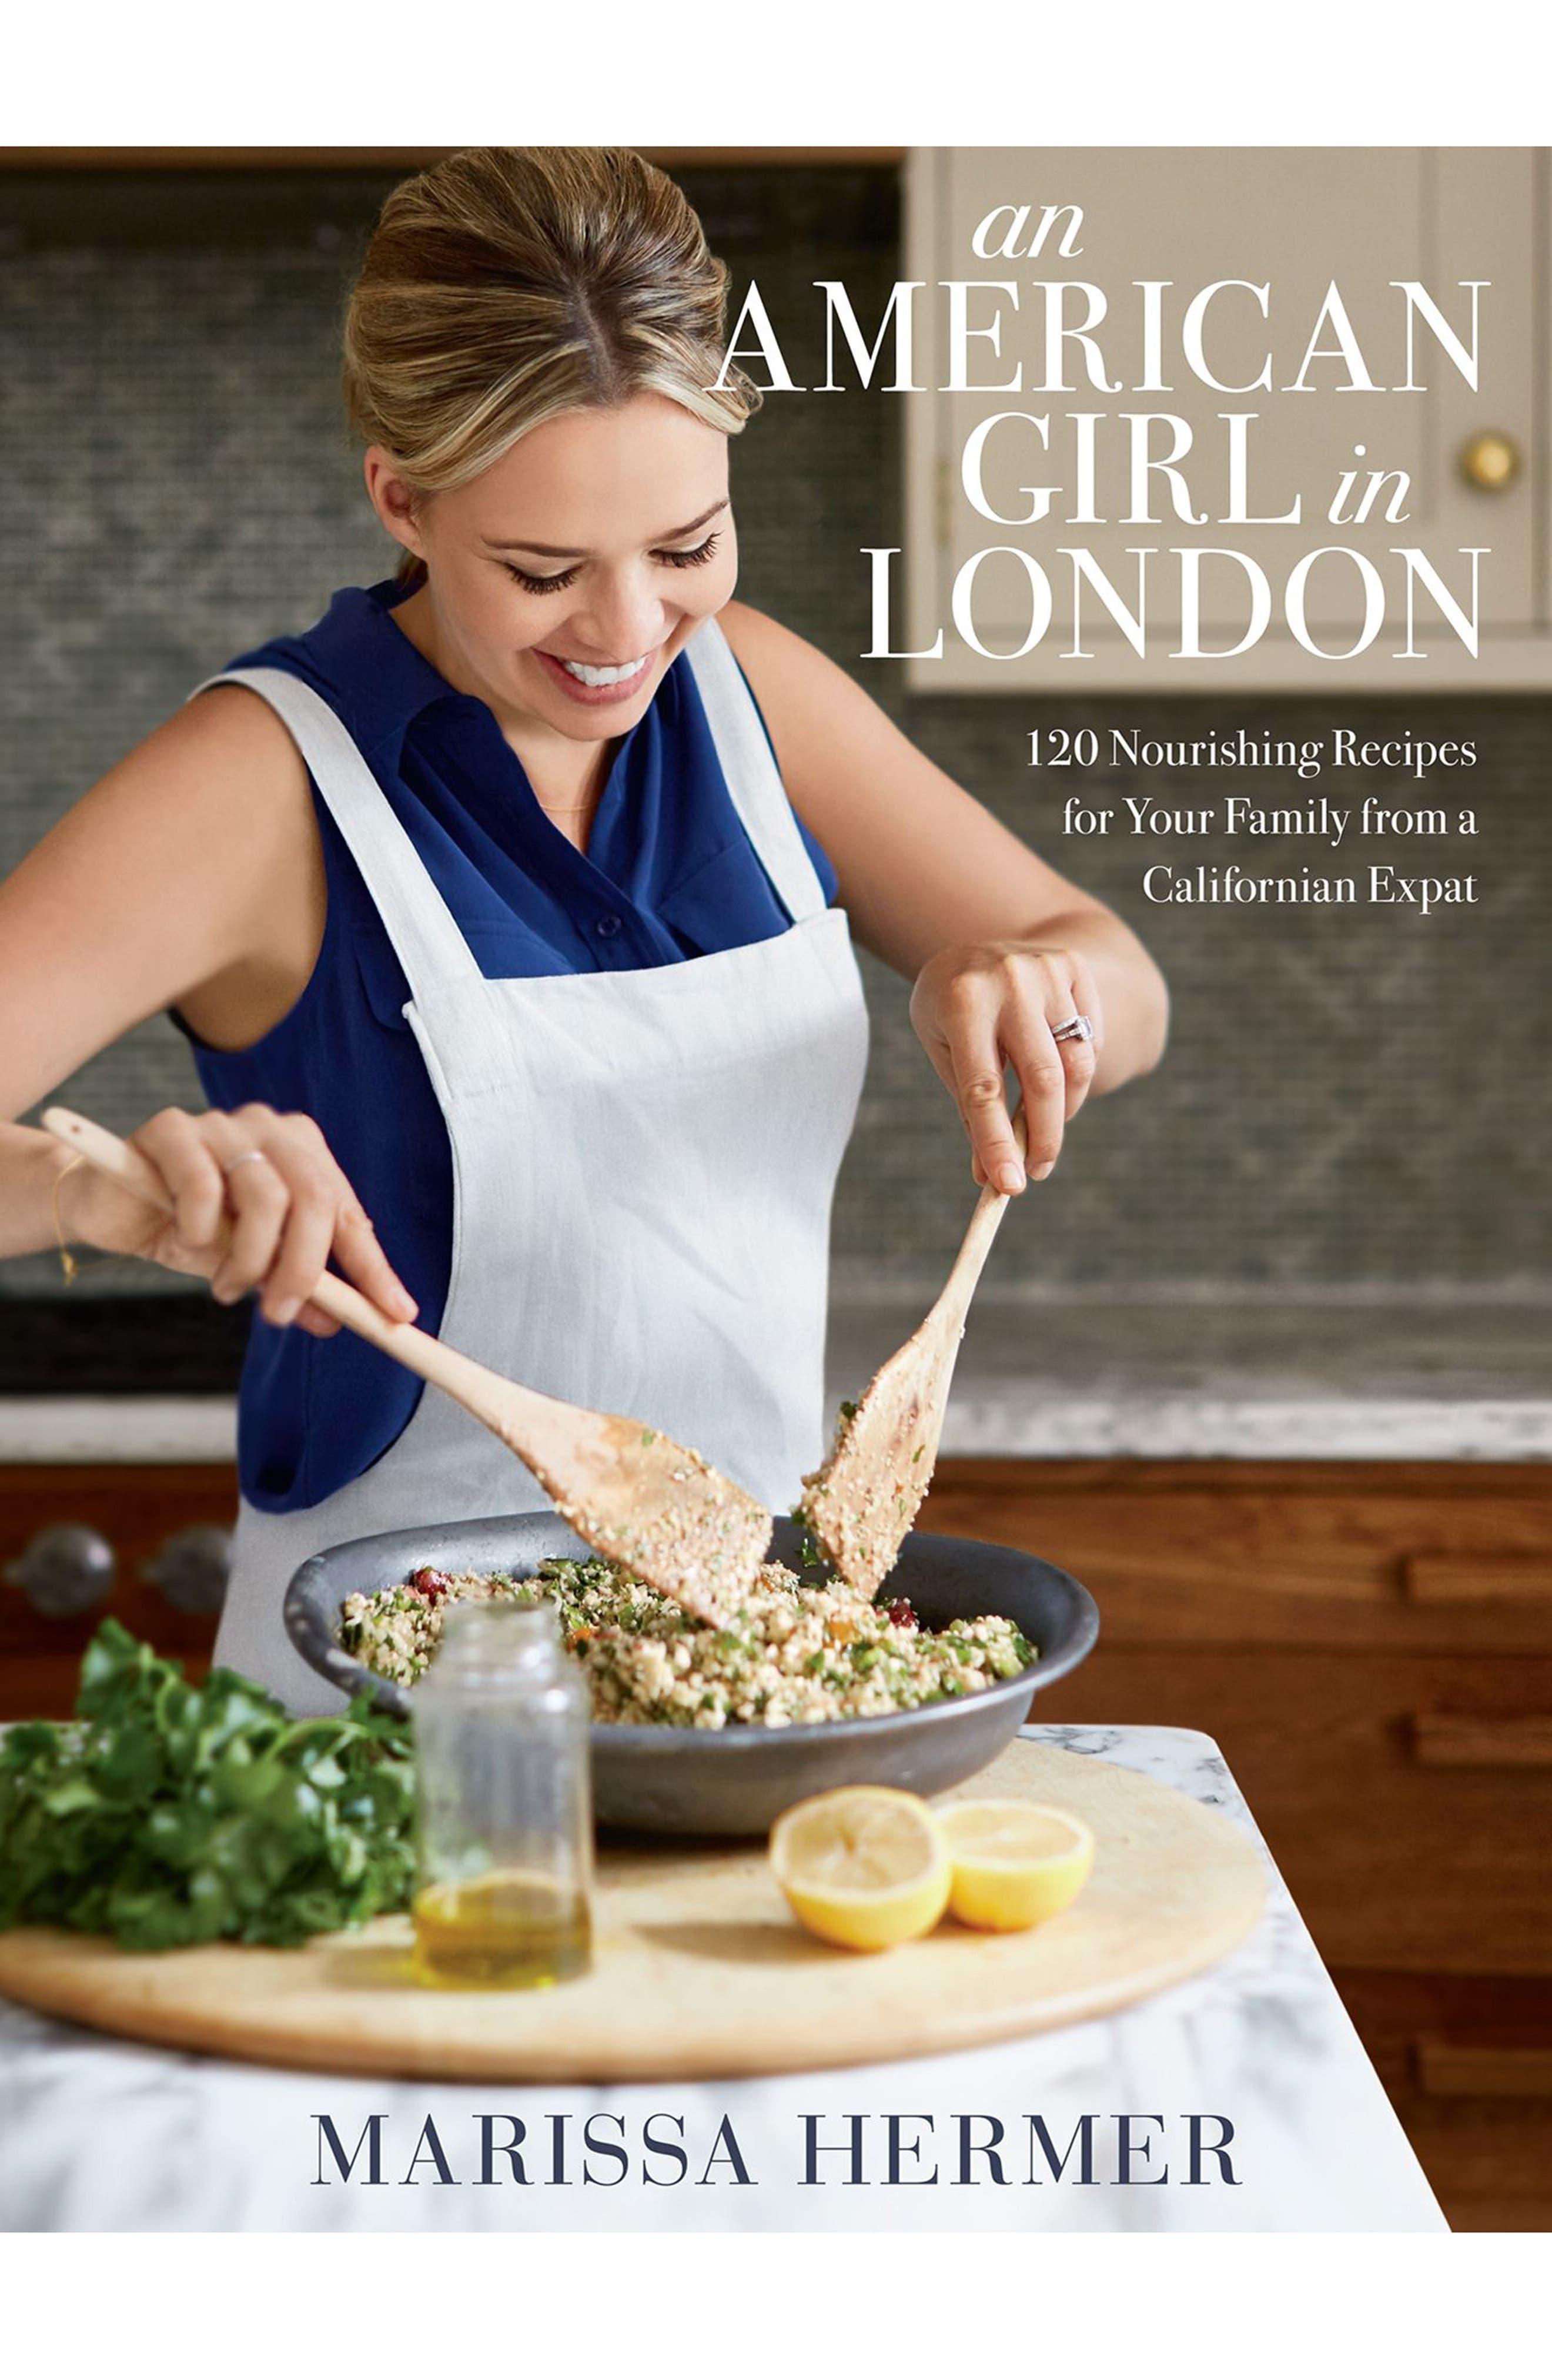 An American Girl in London Cookbook